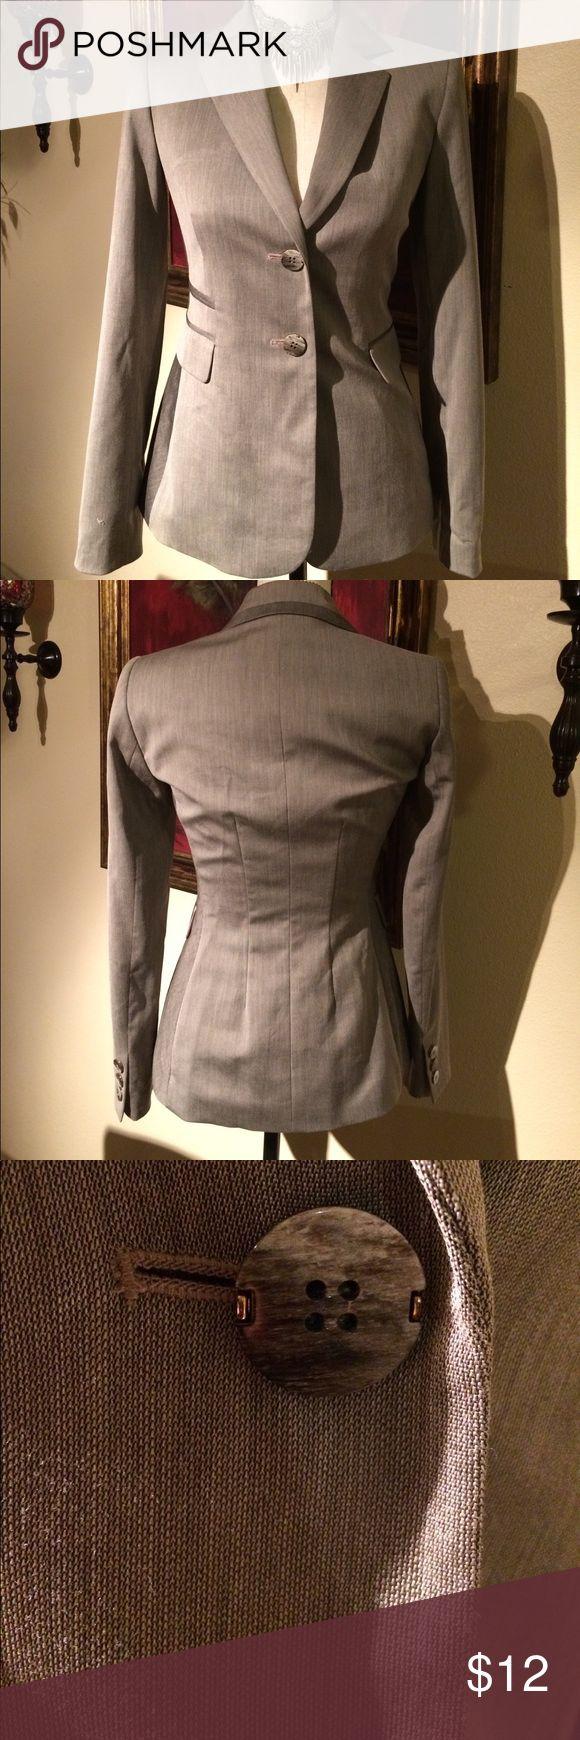 Antonio Melani blazer Antonio Melani blazer size 0 used in great condition ANTONIO MELANI Jackets & Coats Blazers